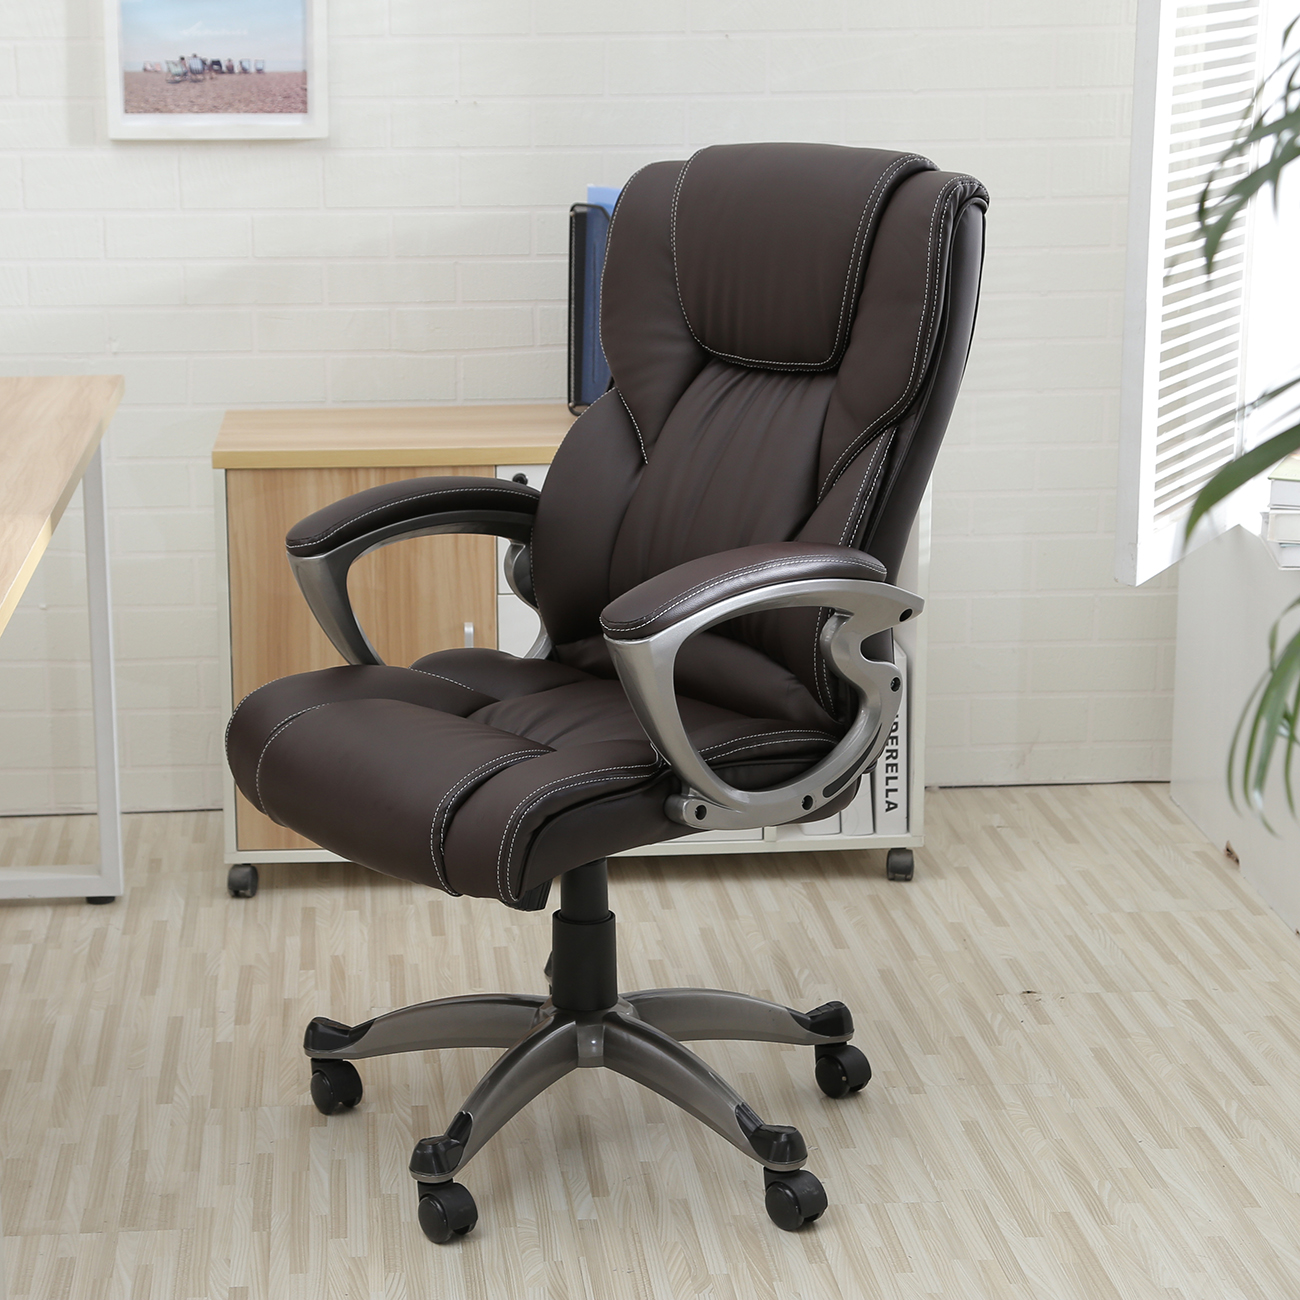 executive office chair high back task ergonomic computer desk study pu leather ebay. Black Bedroom Furniture Sets. Home Design Ideas